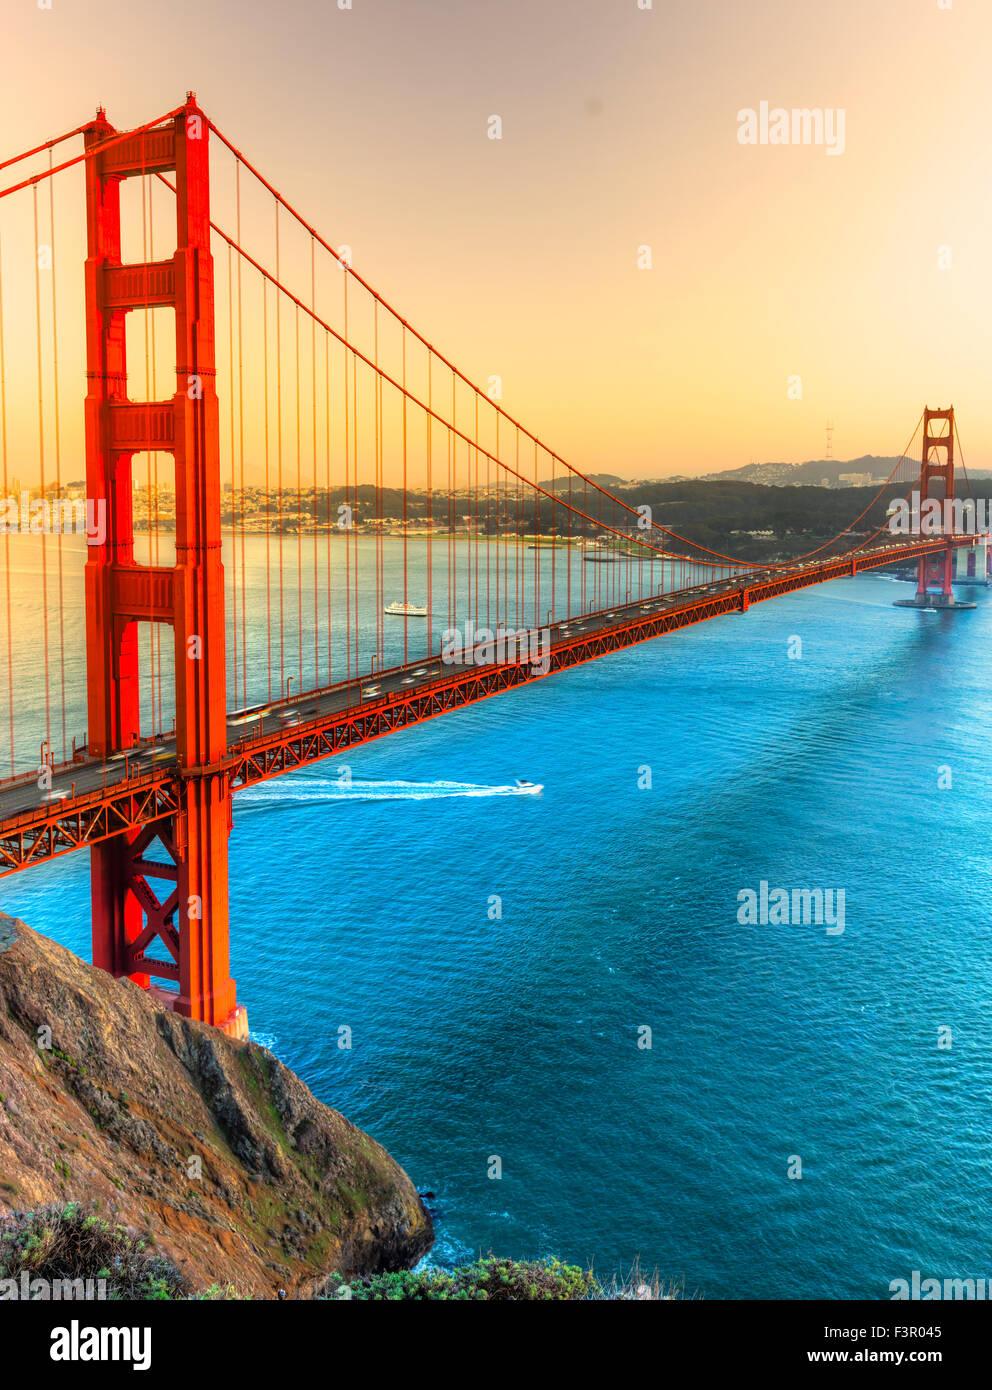 Golden Gate Bridge, San Francisco, Californie, USA. Photo Stock